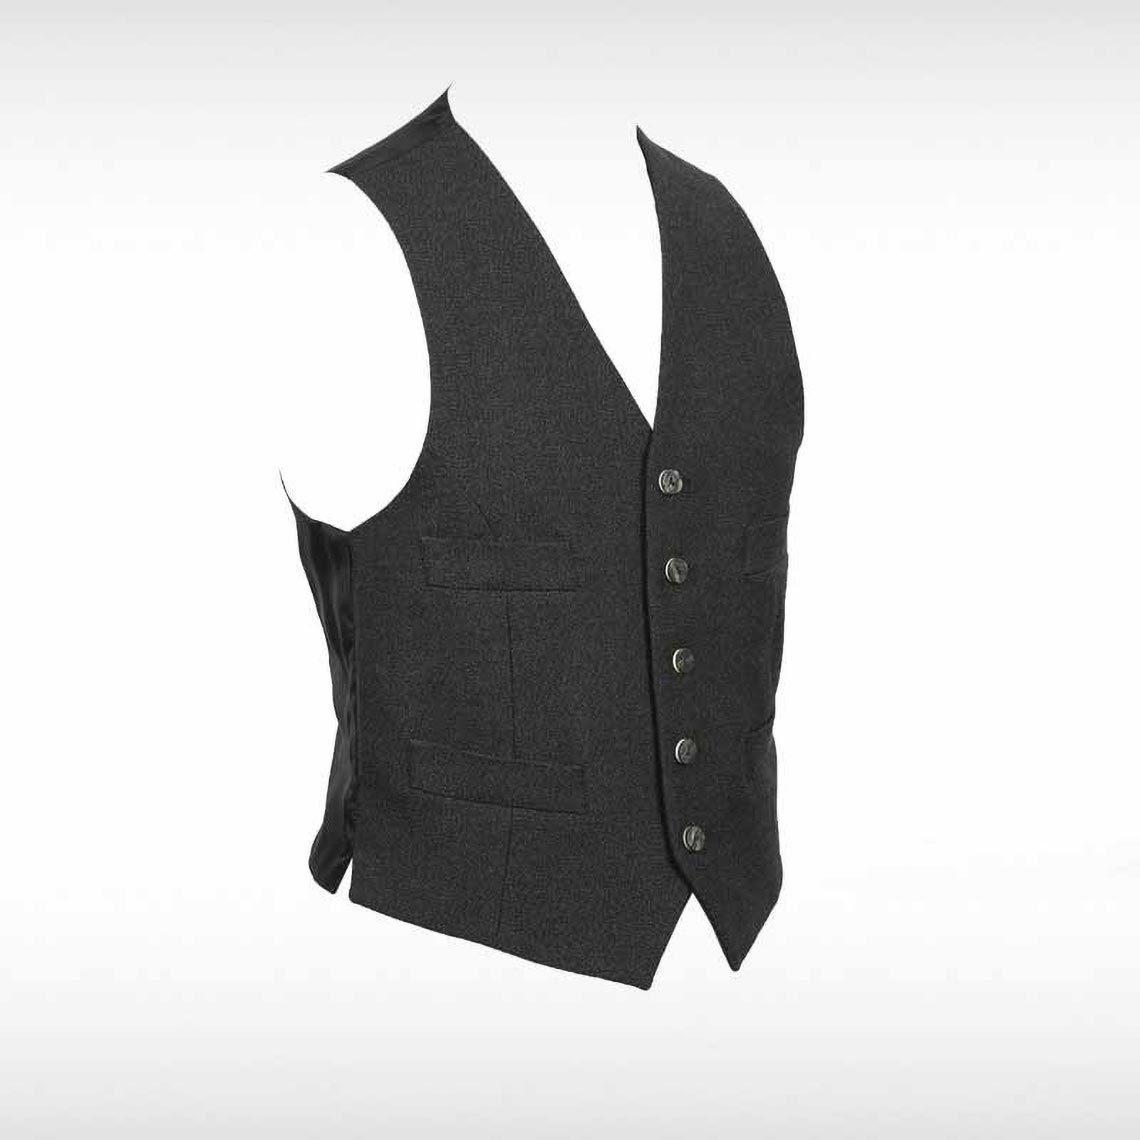 Charcoal Argyll Jacket & Waistcoat